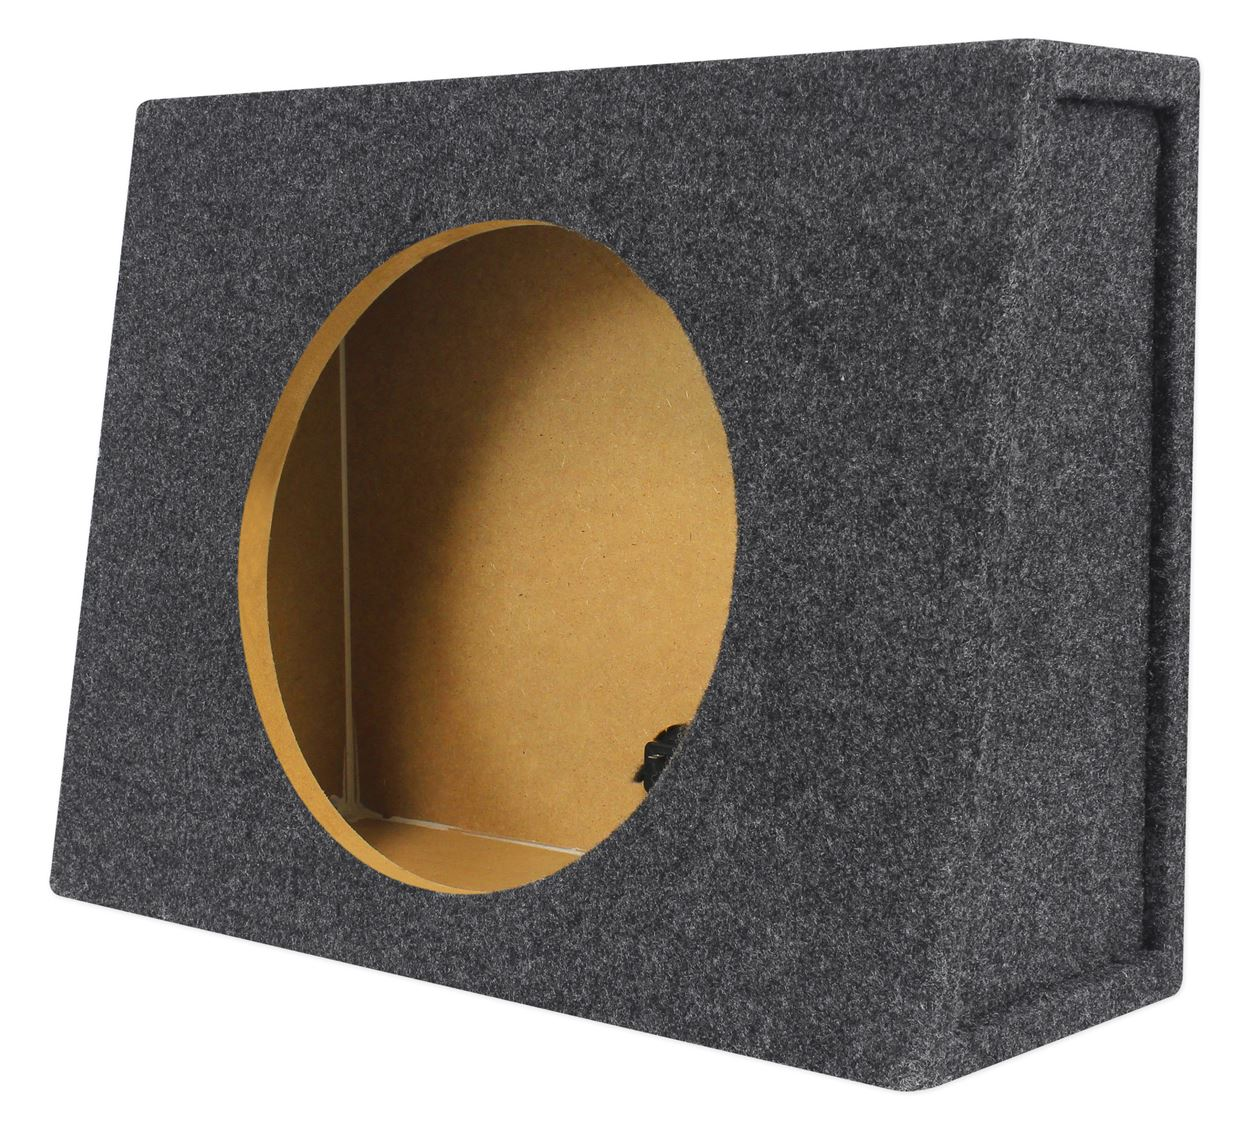 "Rockville Shallow Box Enclosure For Kicker 43CVT124 CompVT 12"" Subwoofer"